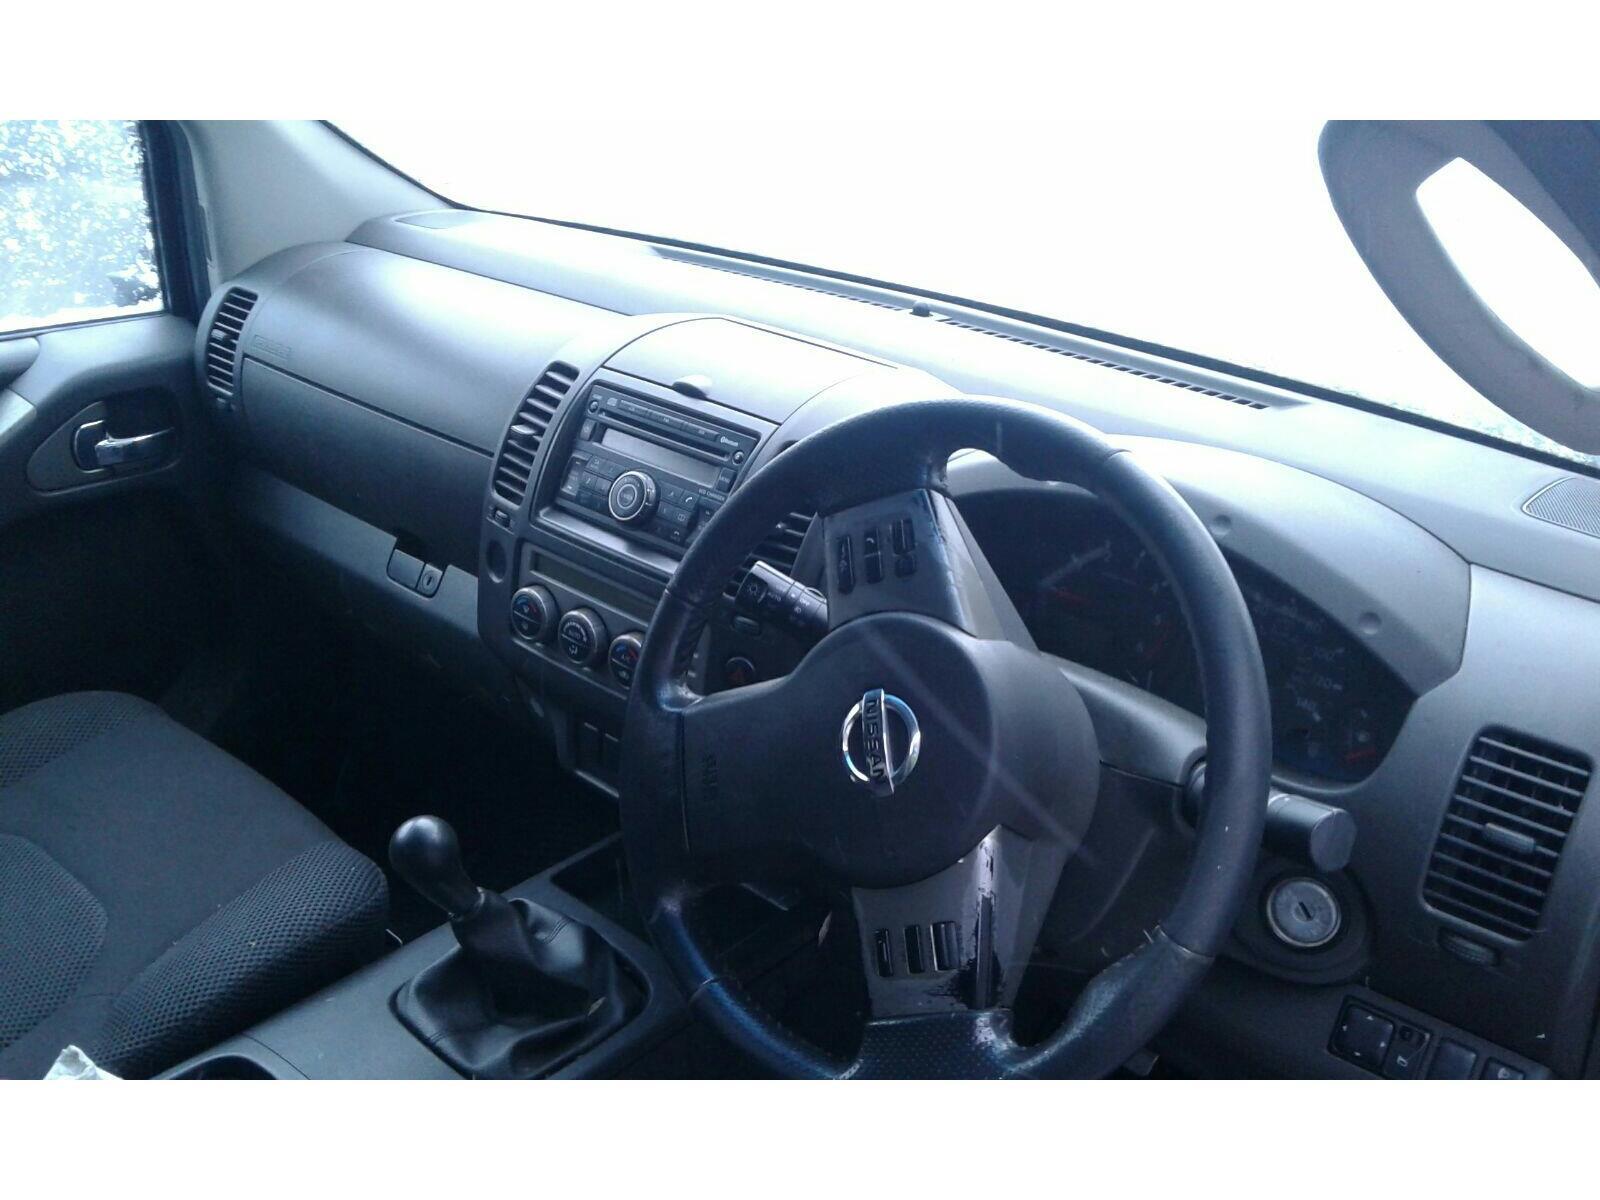 2008 Nissan Navara 2005 To 2010 Pick Up Diesel Manual Breaking Fuse Box Location